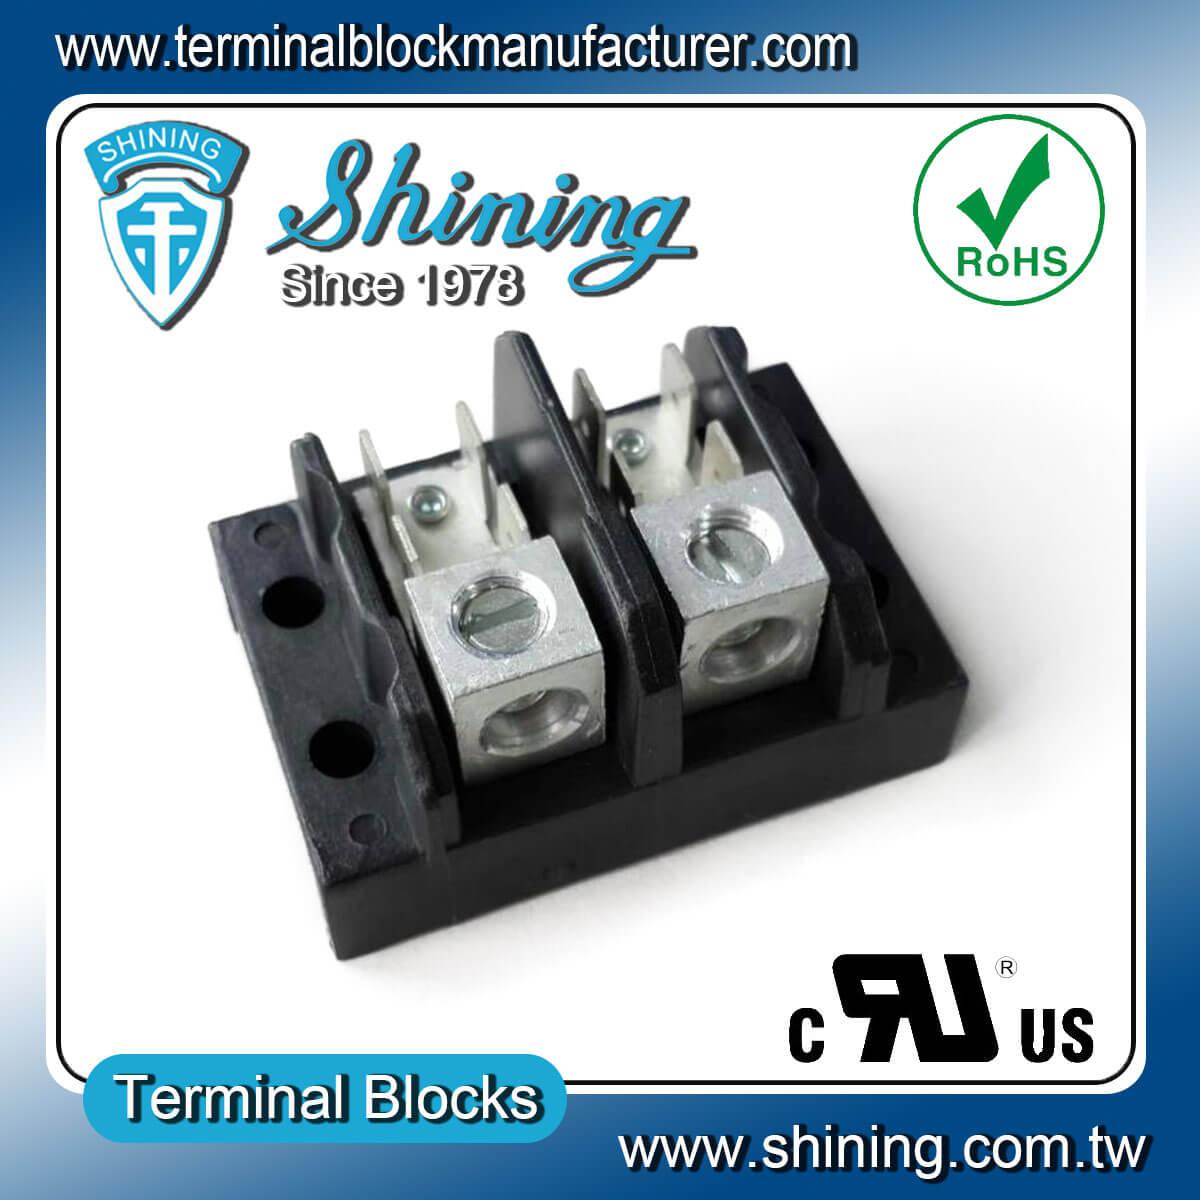 Tgp 050 Xxa1 Series 600v 50a Electrical Power Terminal Block Wiring 02a1 2pole Termi